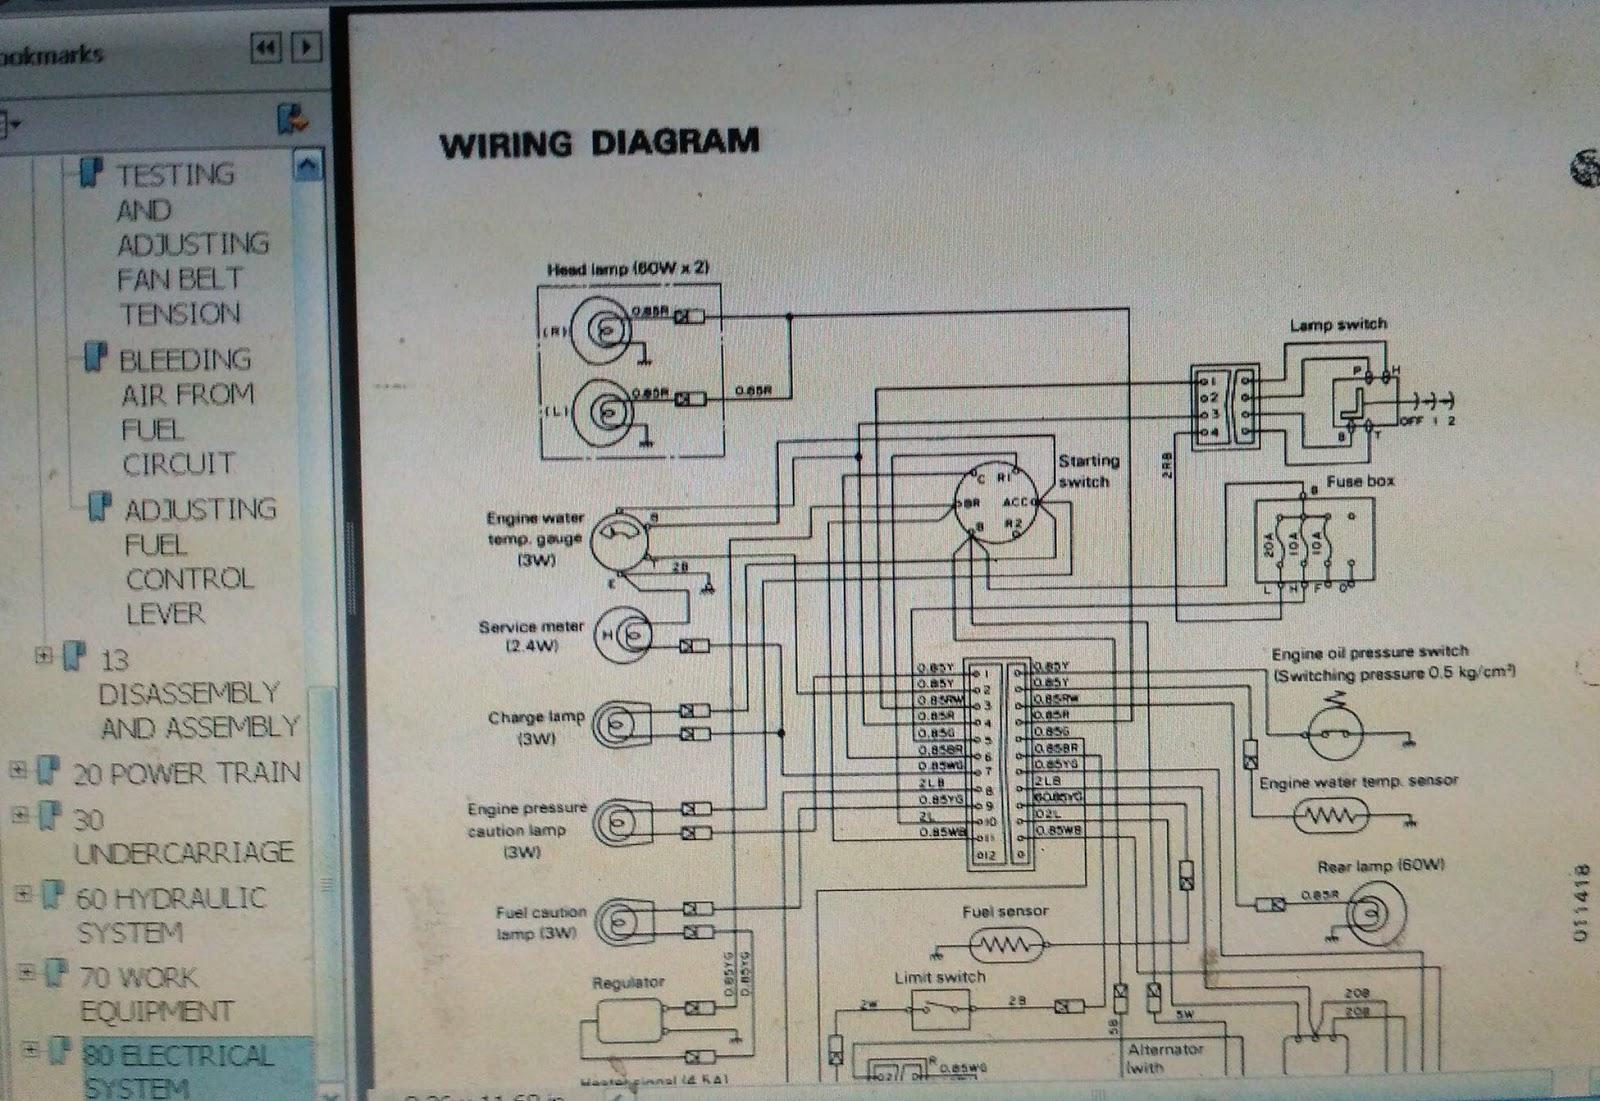 Komatsu D31p Wiring Diagram Wheel Loader Diagrams 18 Shop Manual Bulldozer Berita Book Kamatsu